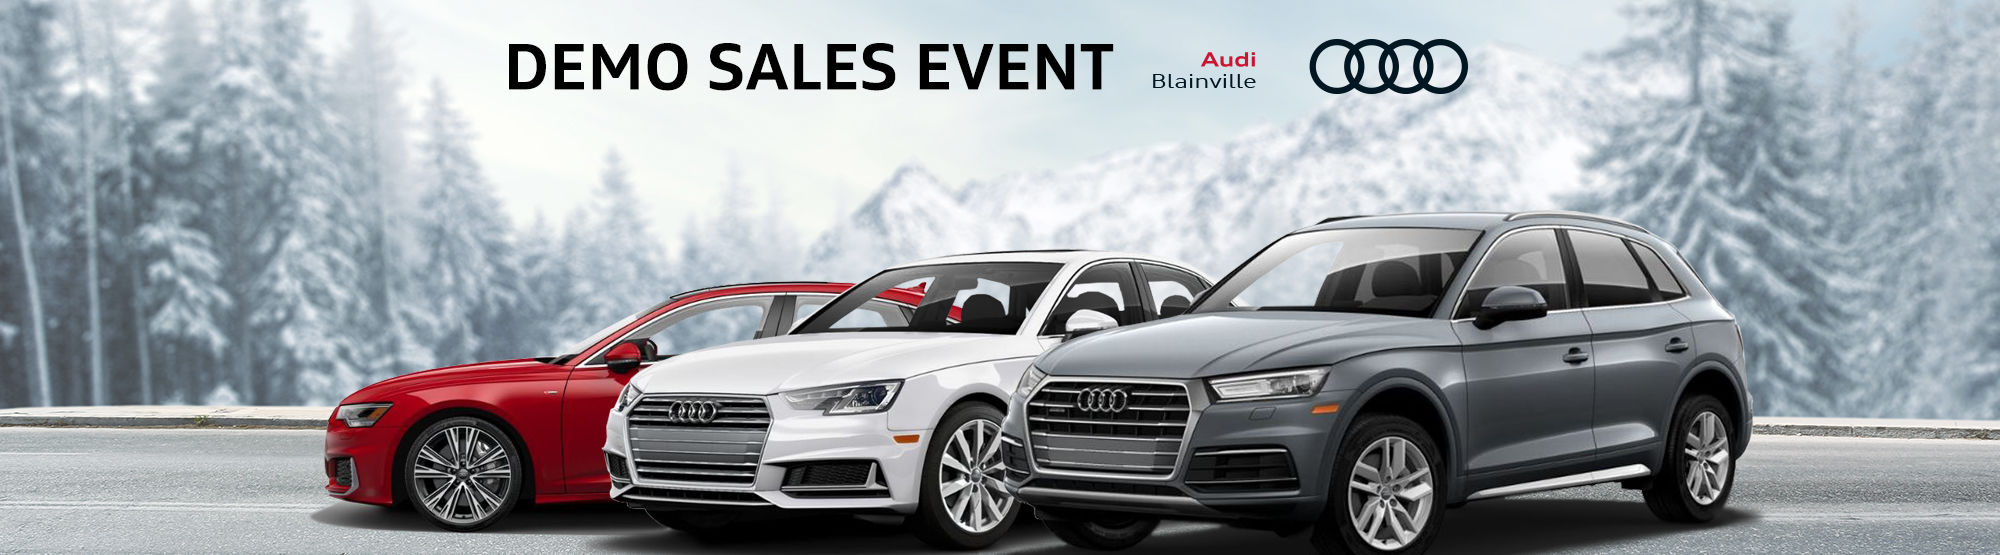 Audi Demo Event